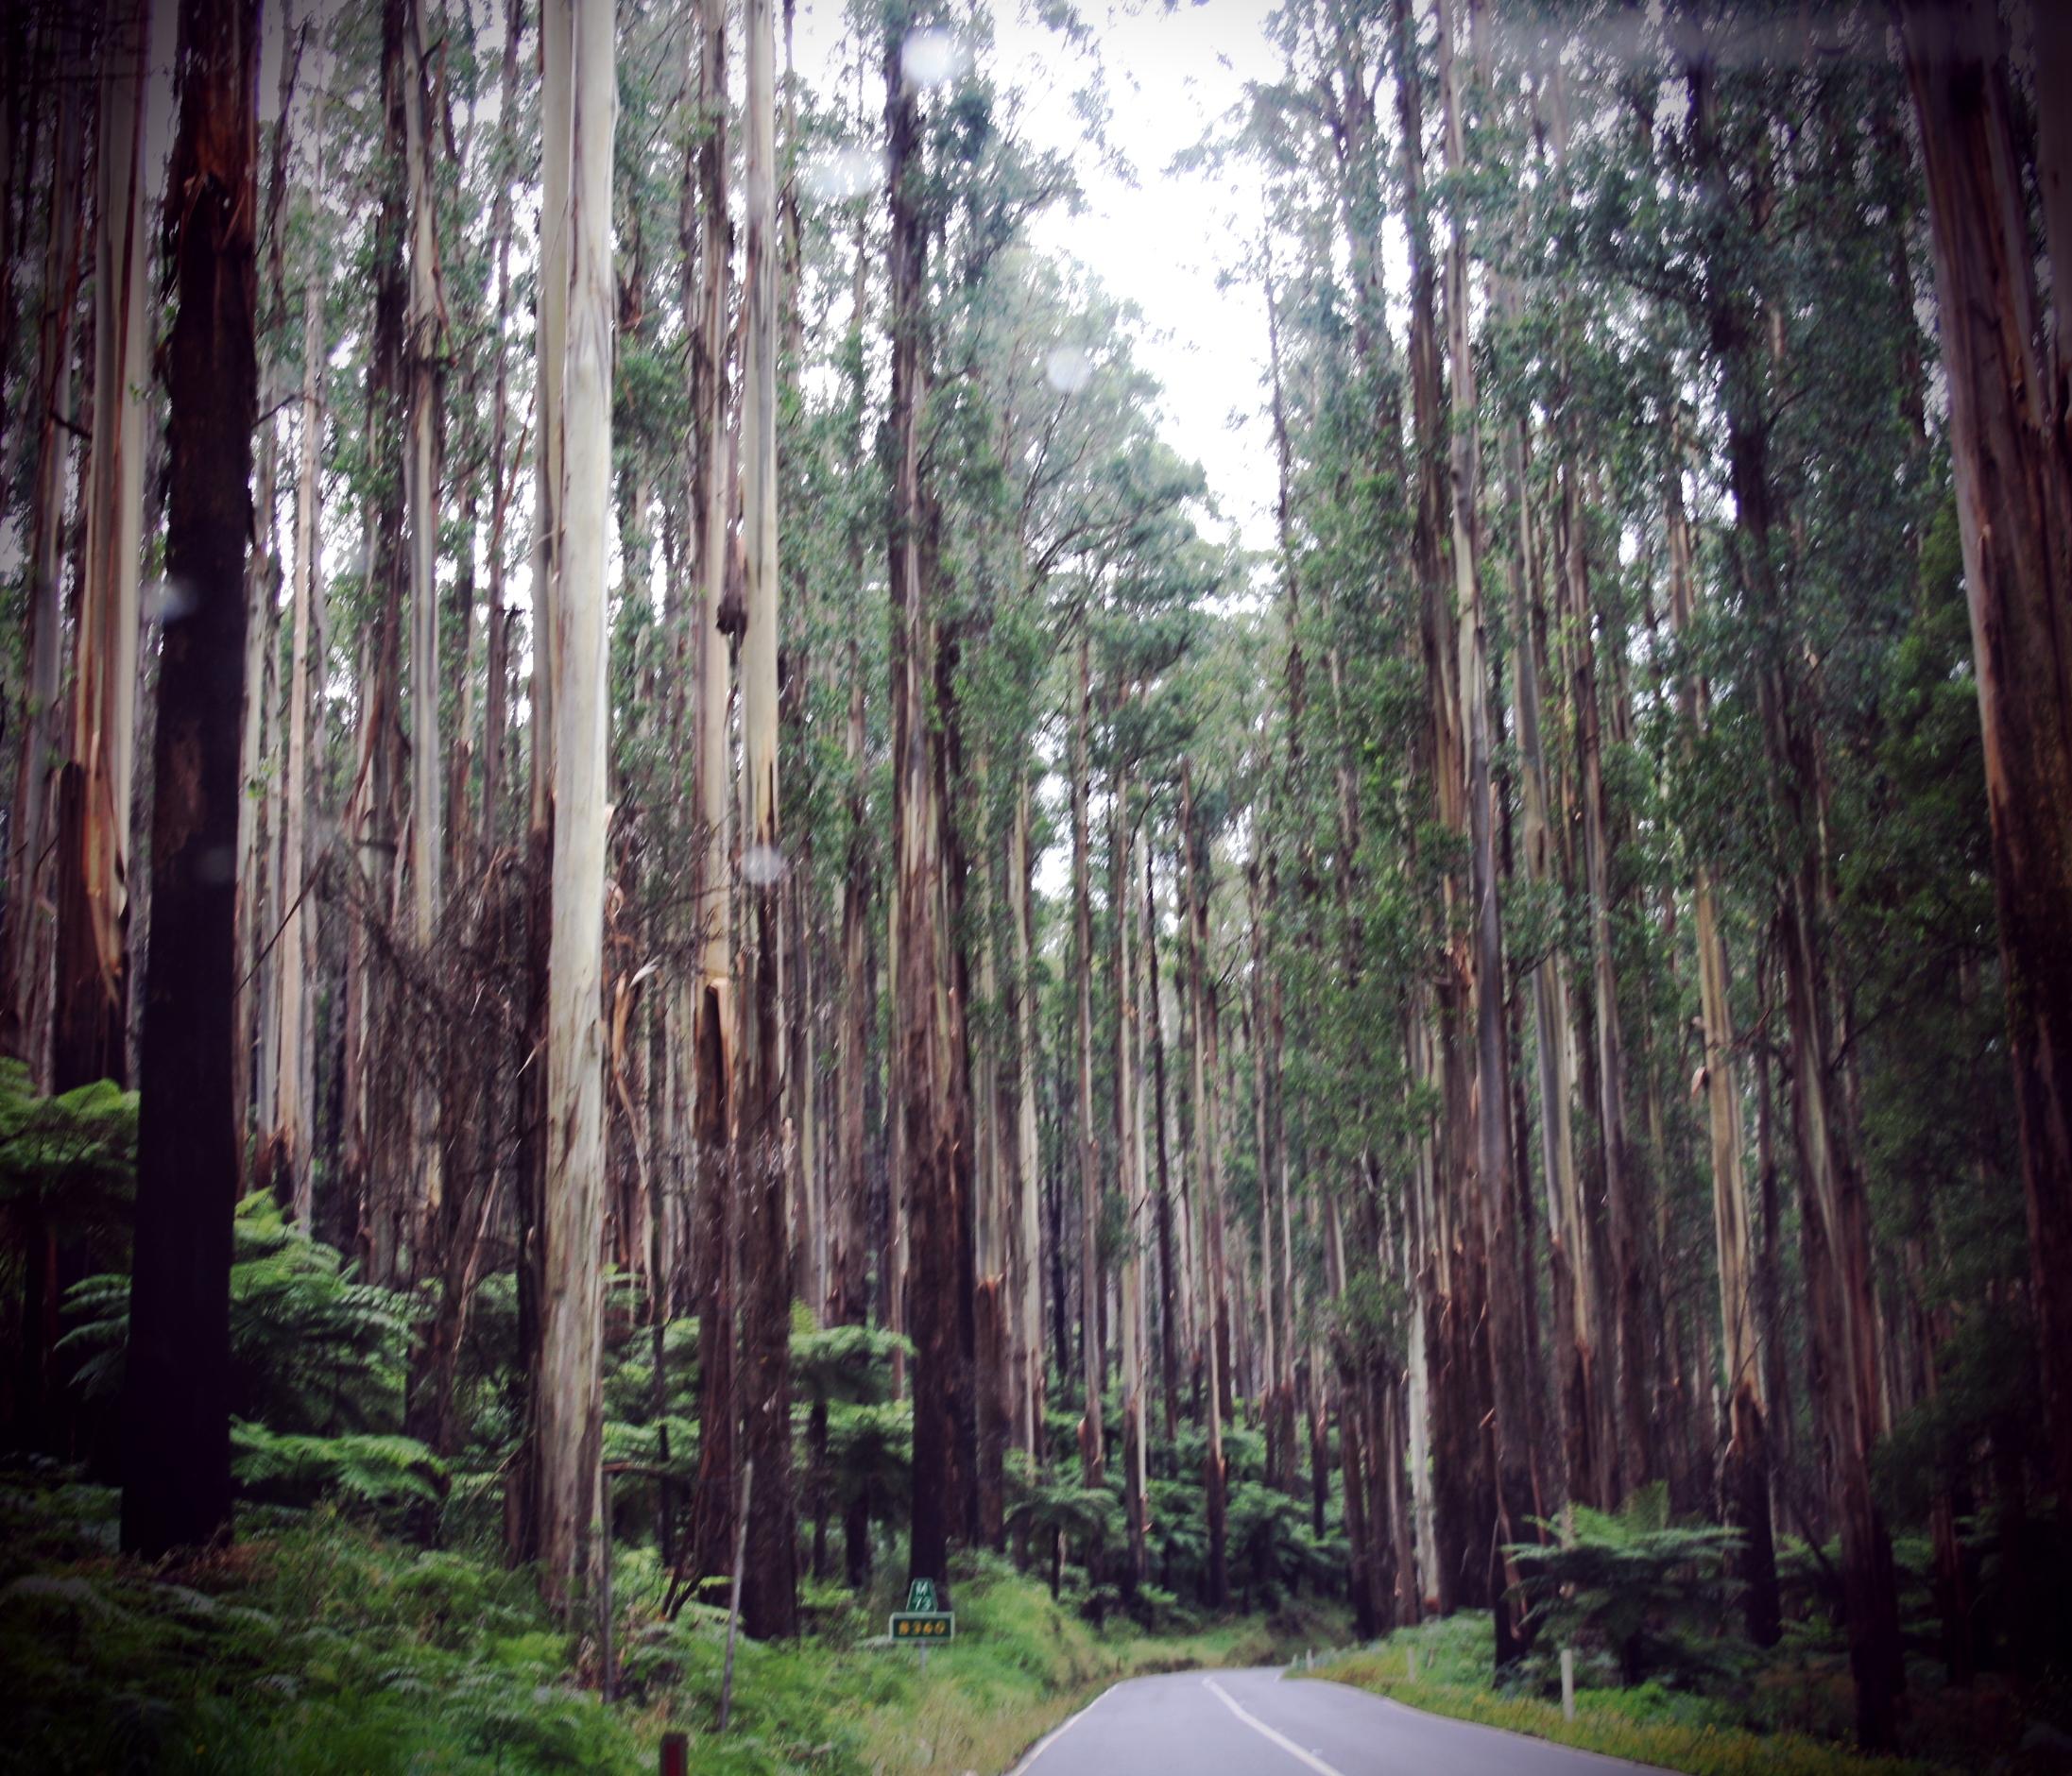 healesville scenic drive.jpg